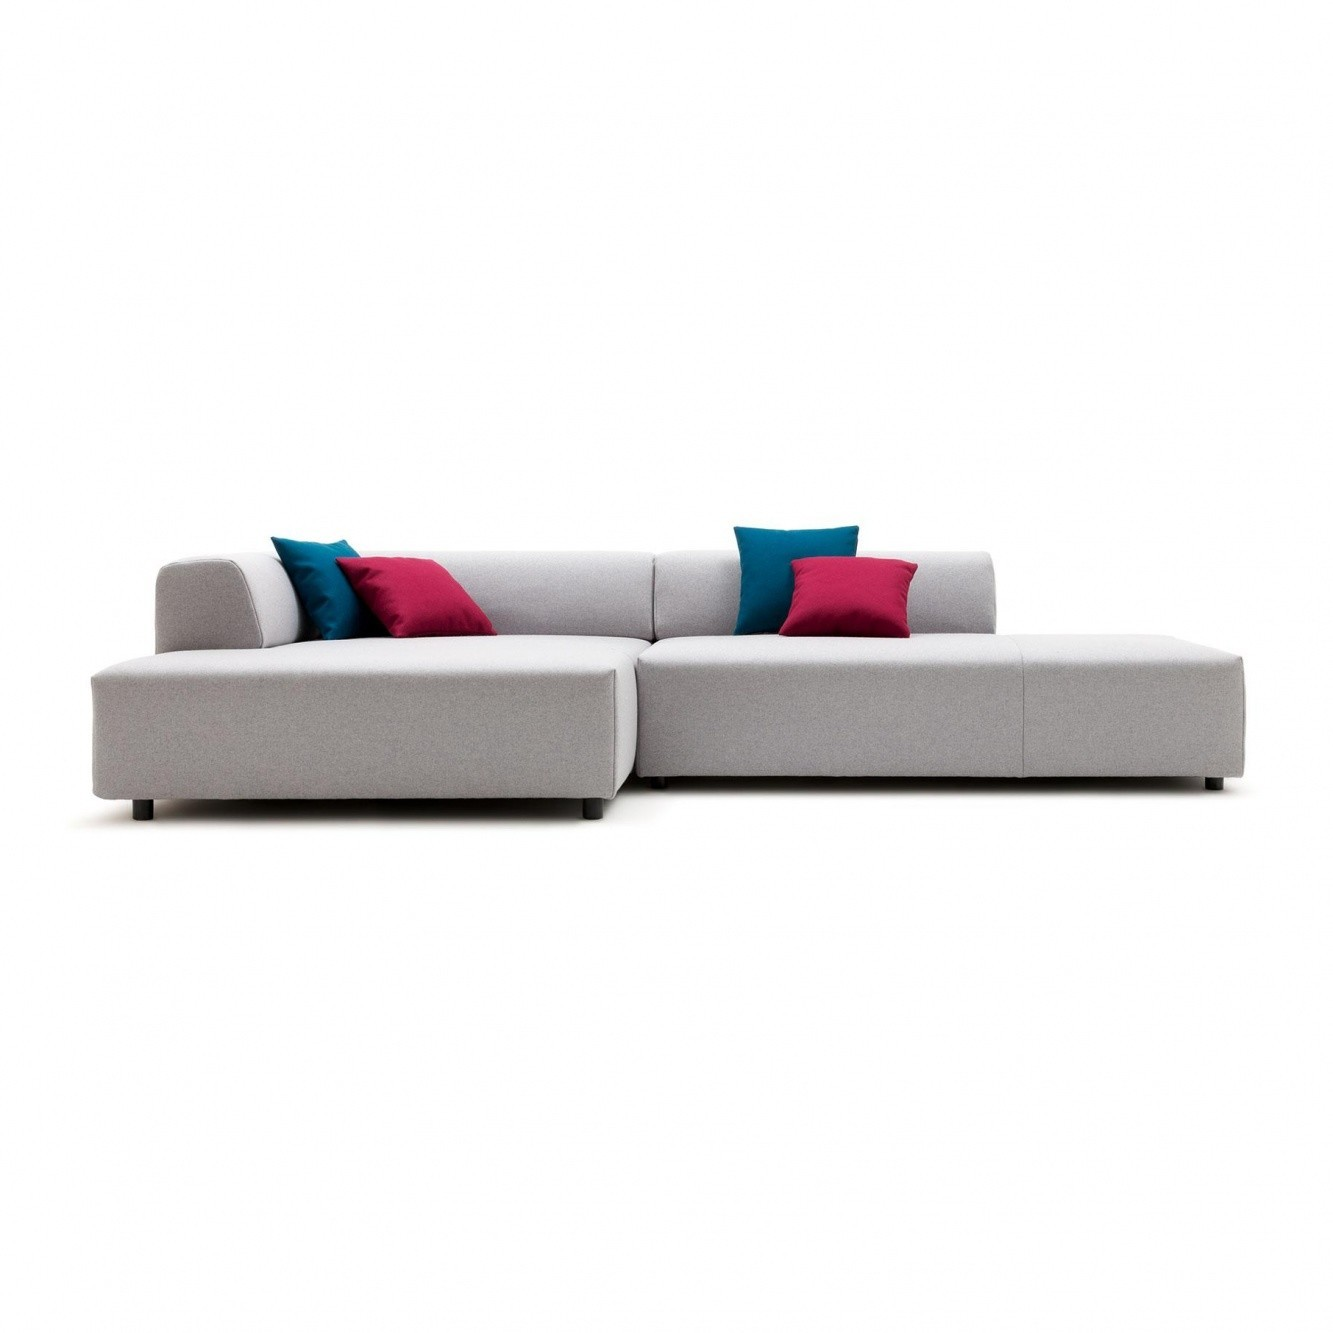 Freistil Rolf Benz Freistil 184 Lounge Sofa Ambientedirect